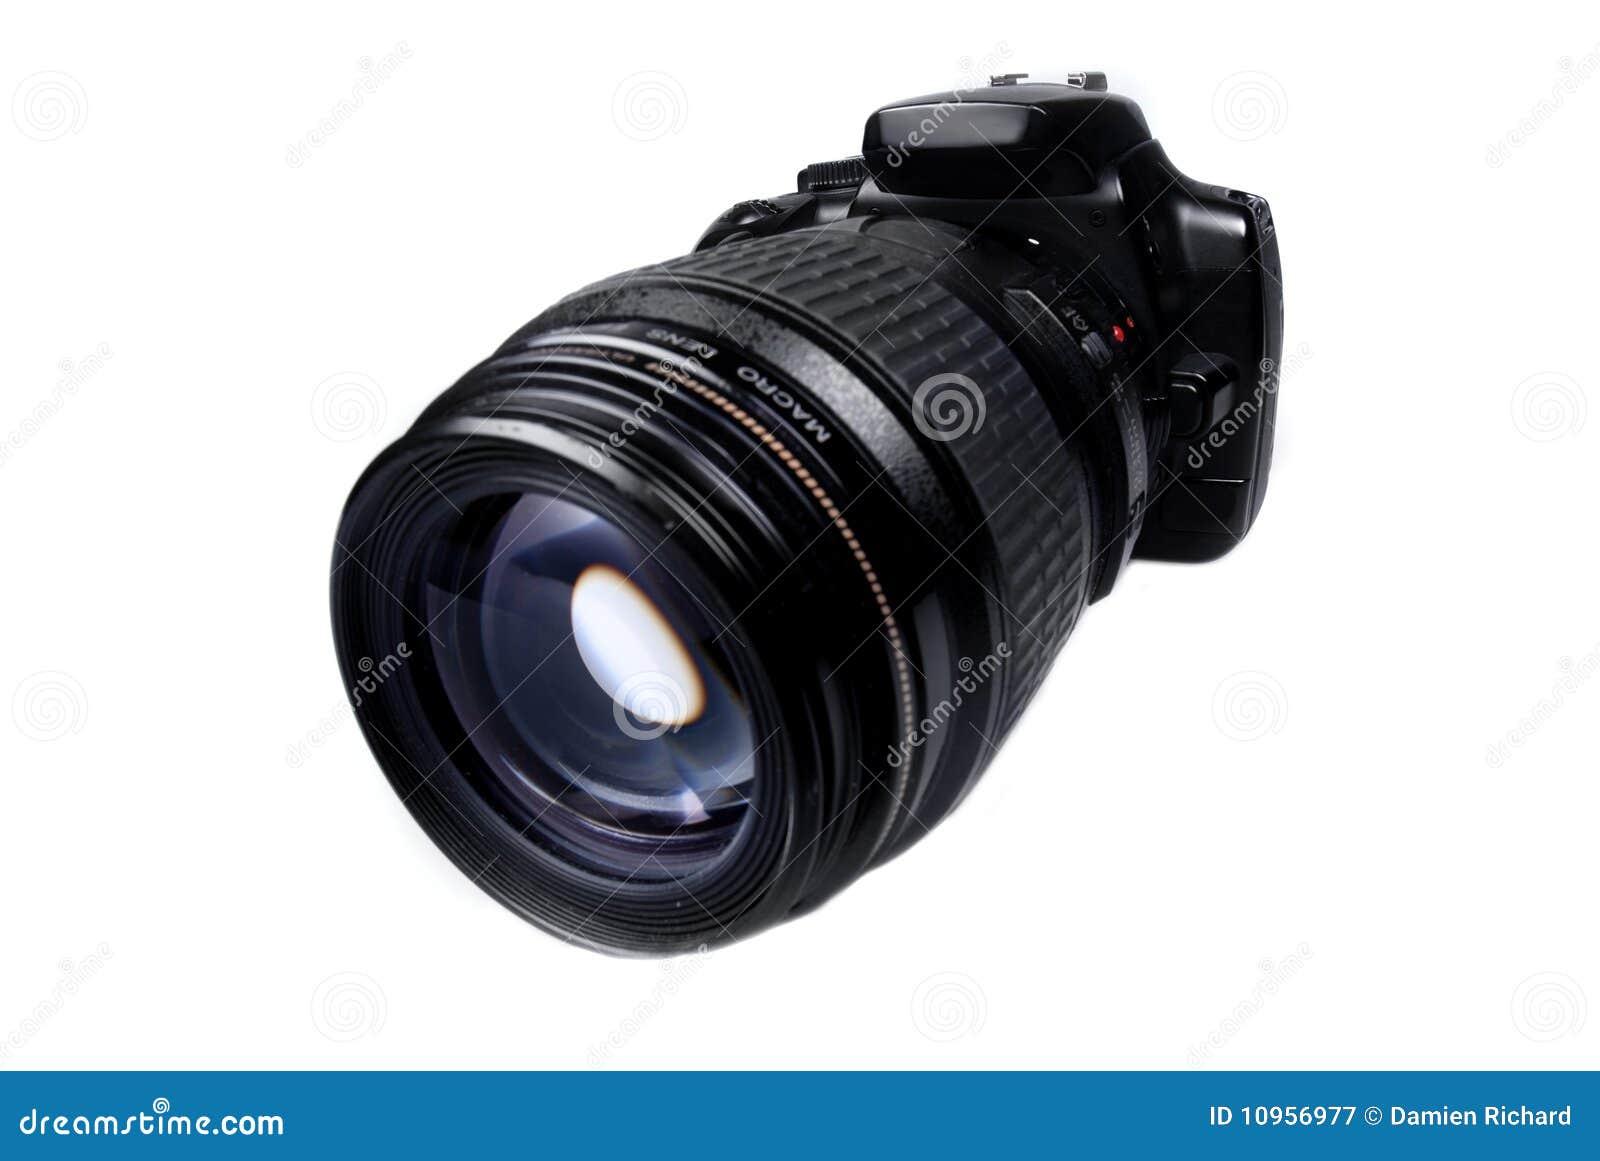 free clipart slr camera - photo #41